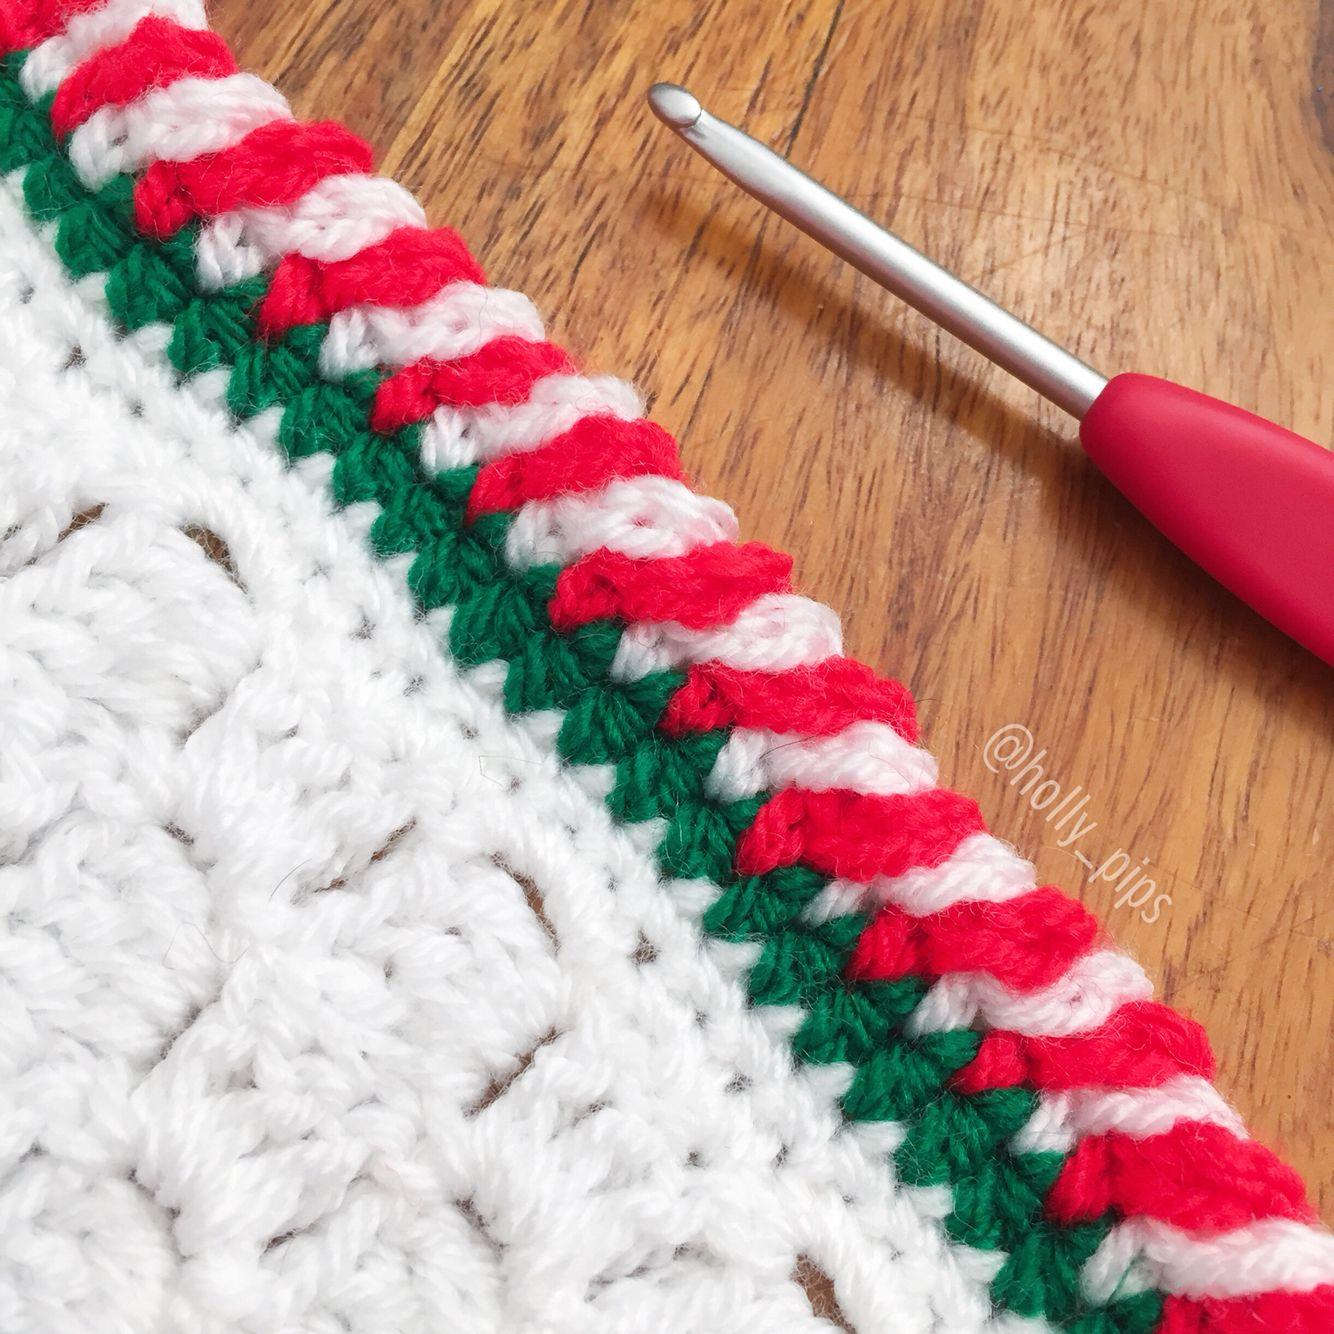 Candy Cane Crochet Border